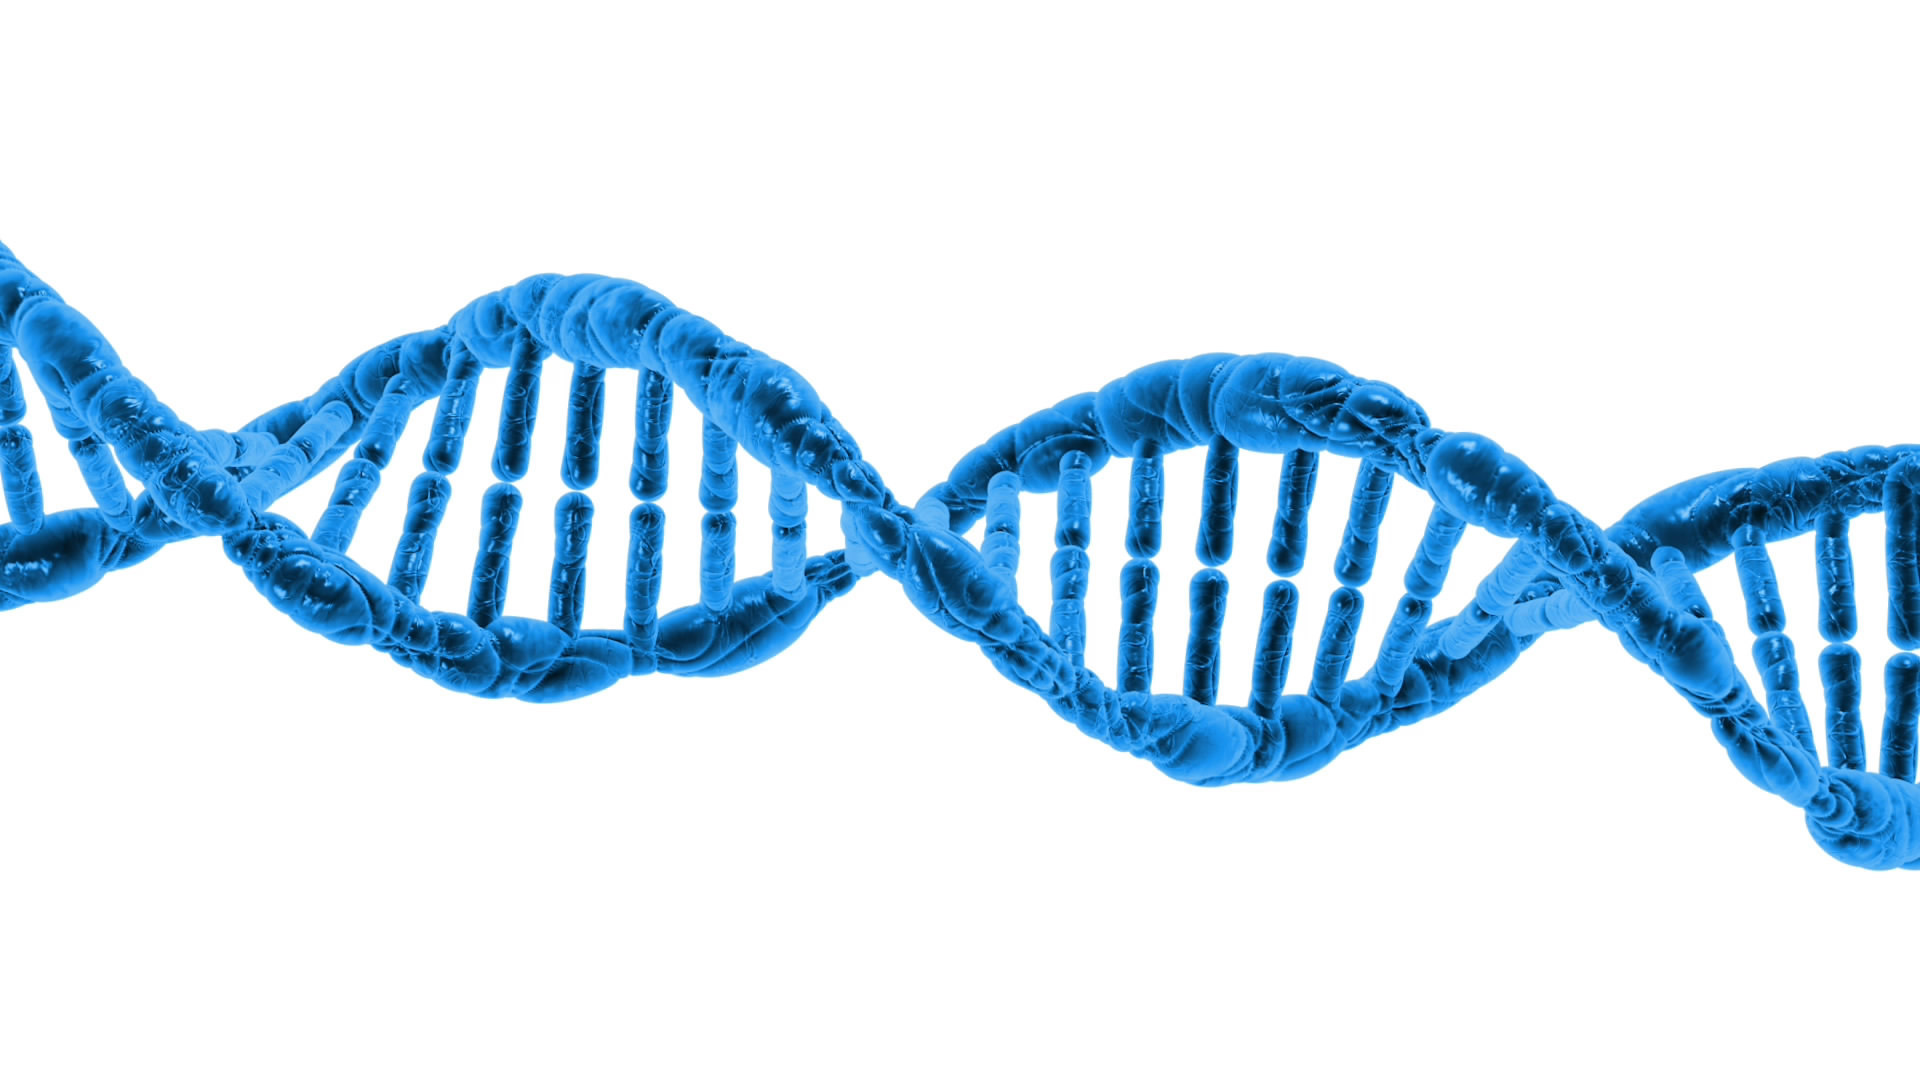 Projet Généalogie ADN